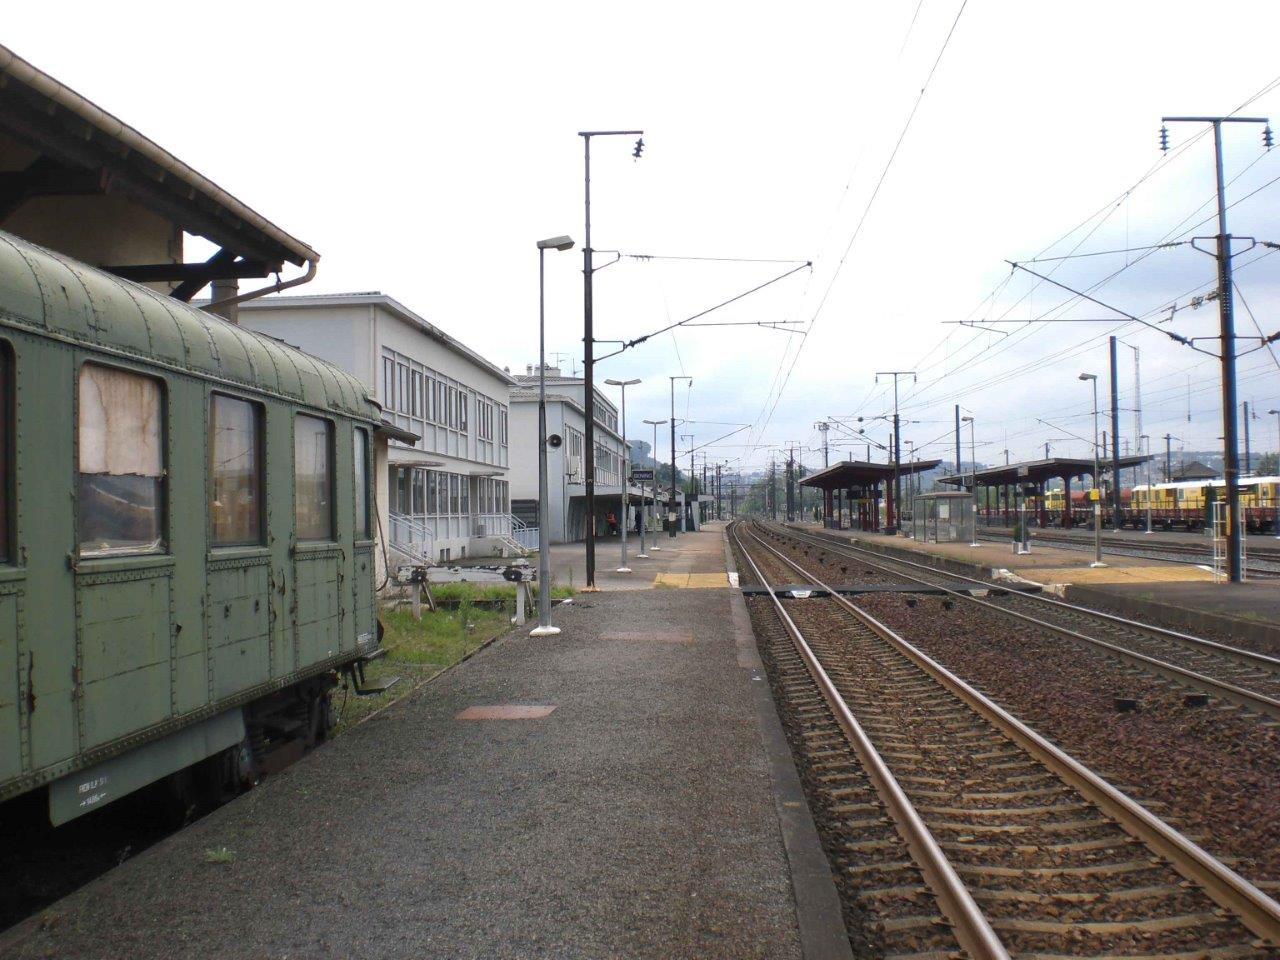 gare-de-bening-train-station